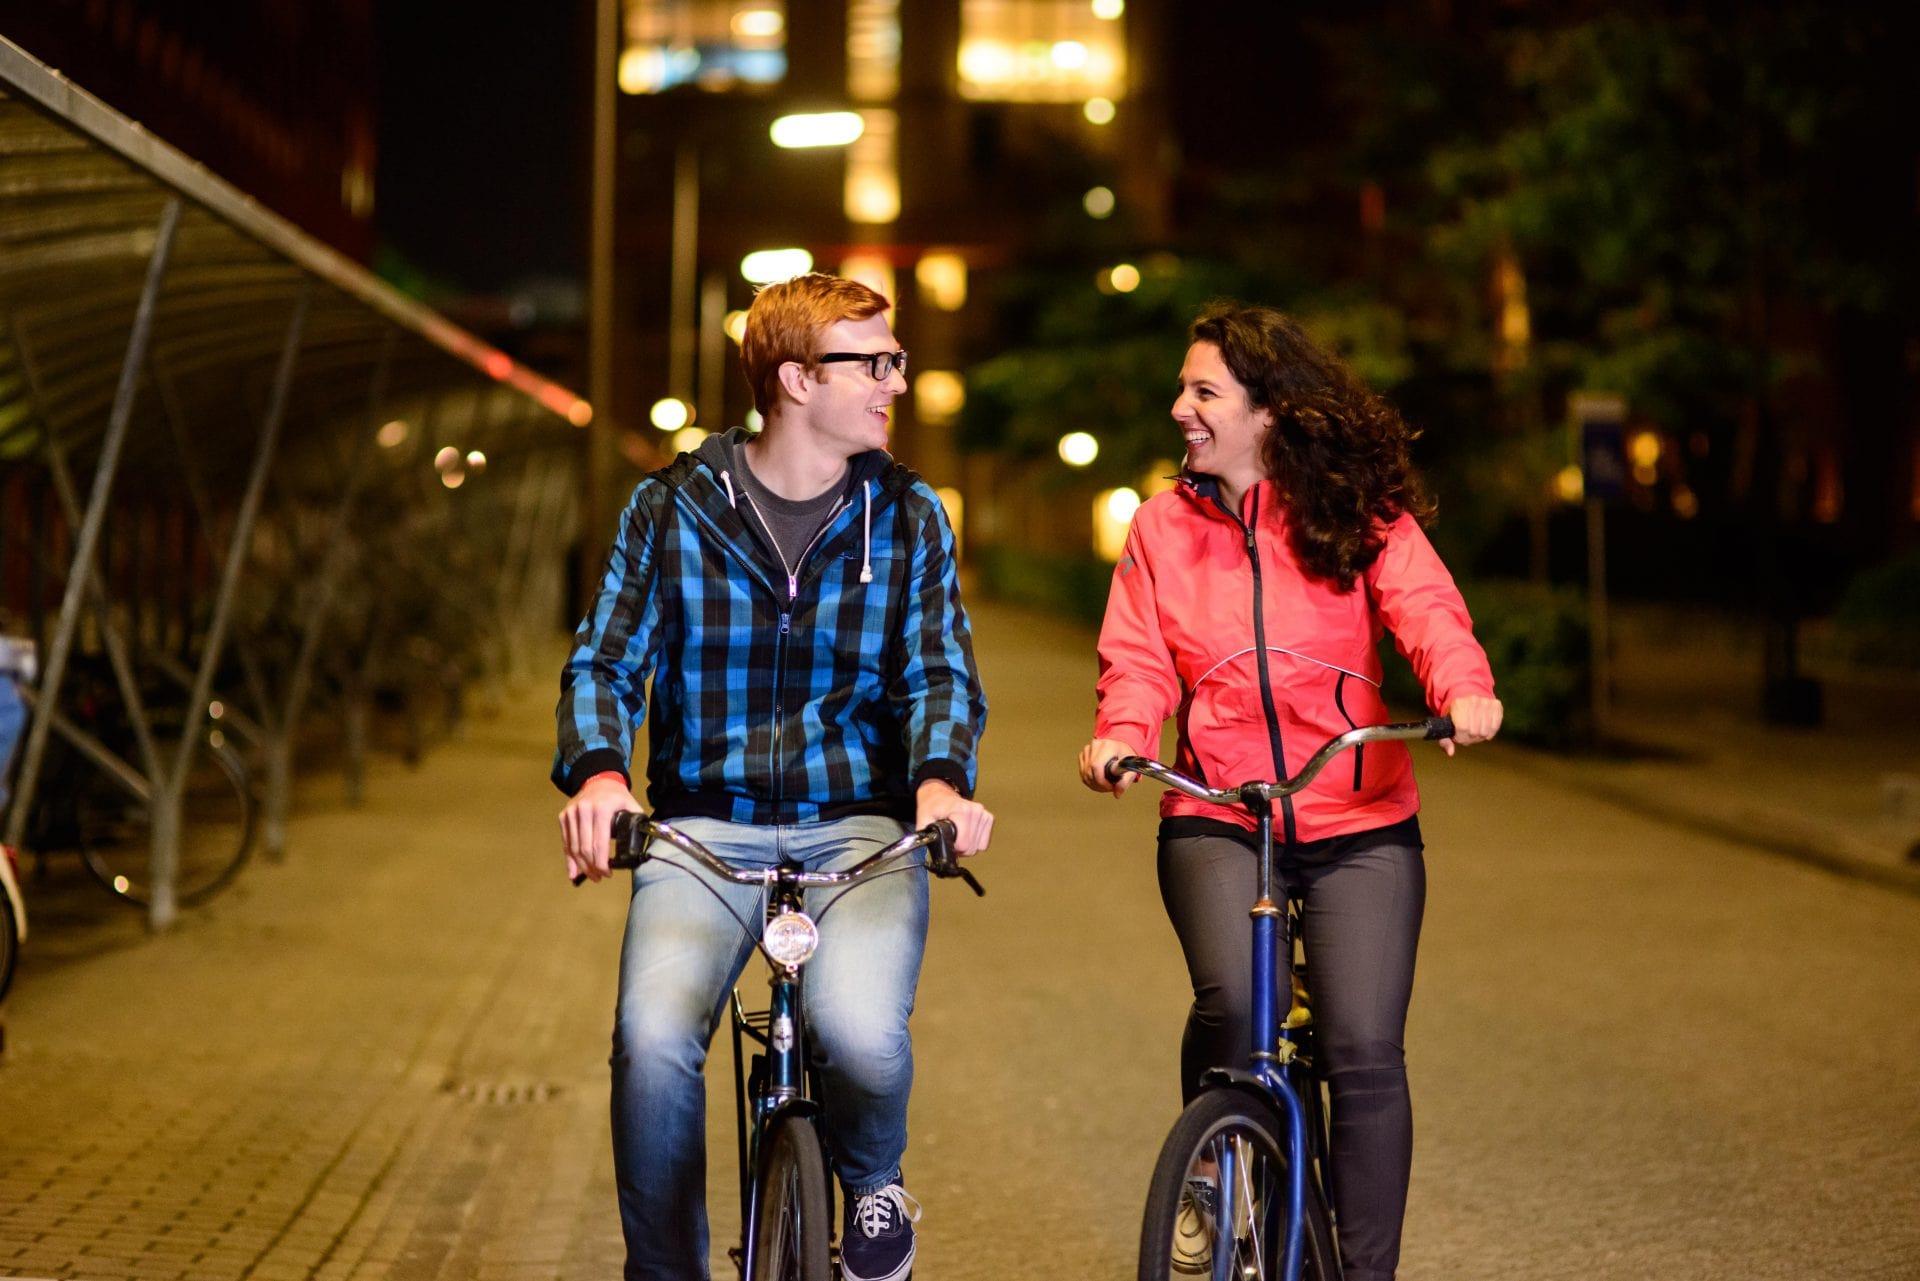 Motion Sensor Smart Street Lighting in Belgium